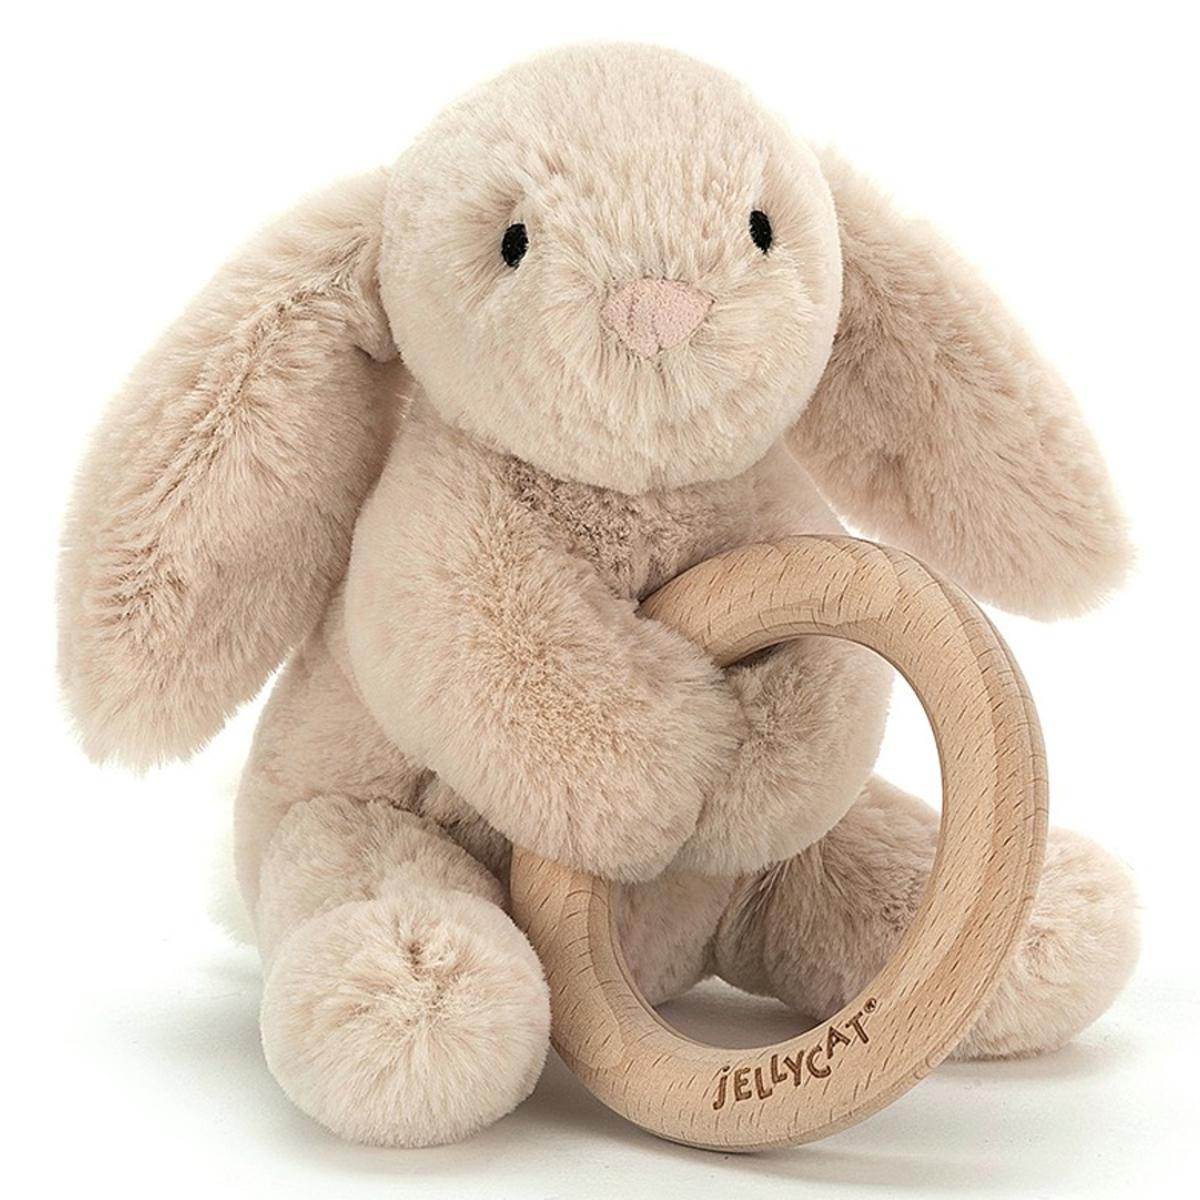 Hochet Hochet Shooshu Bunny avec Anneau en Bois Hochet Shooshu Bunny avec Anneau en Bois